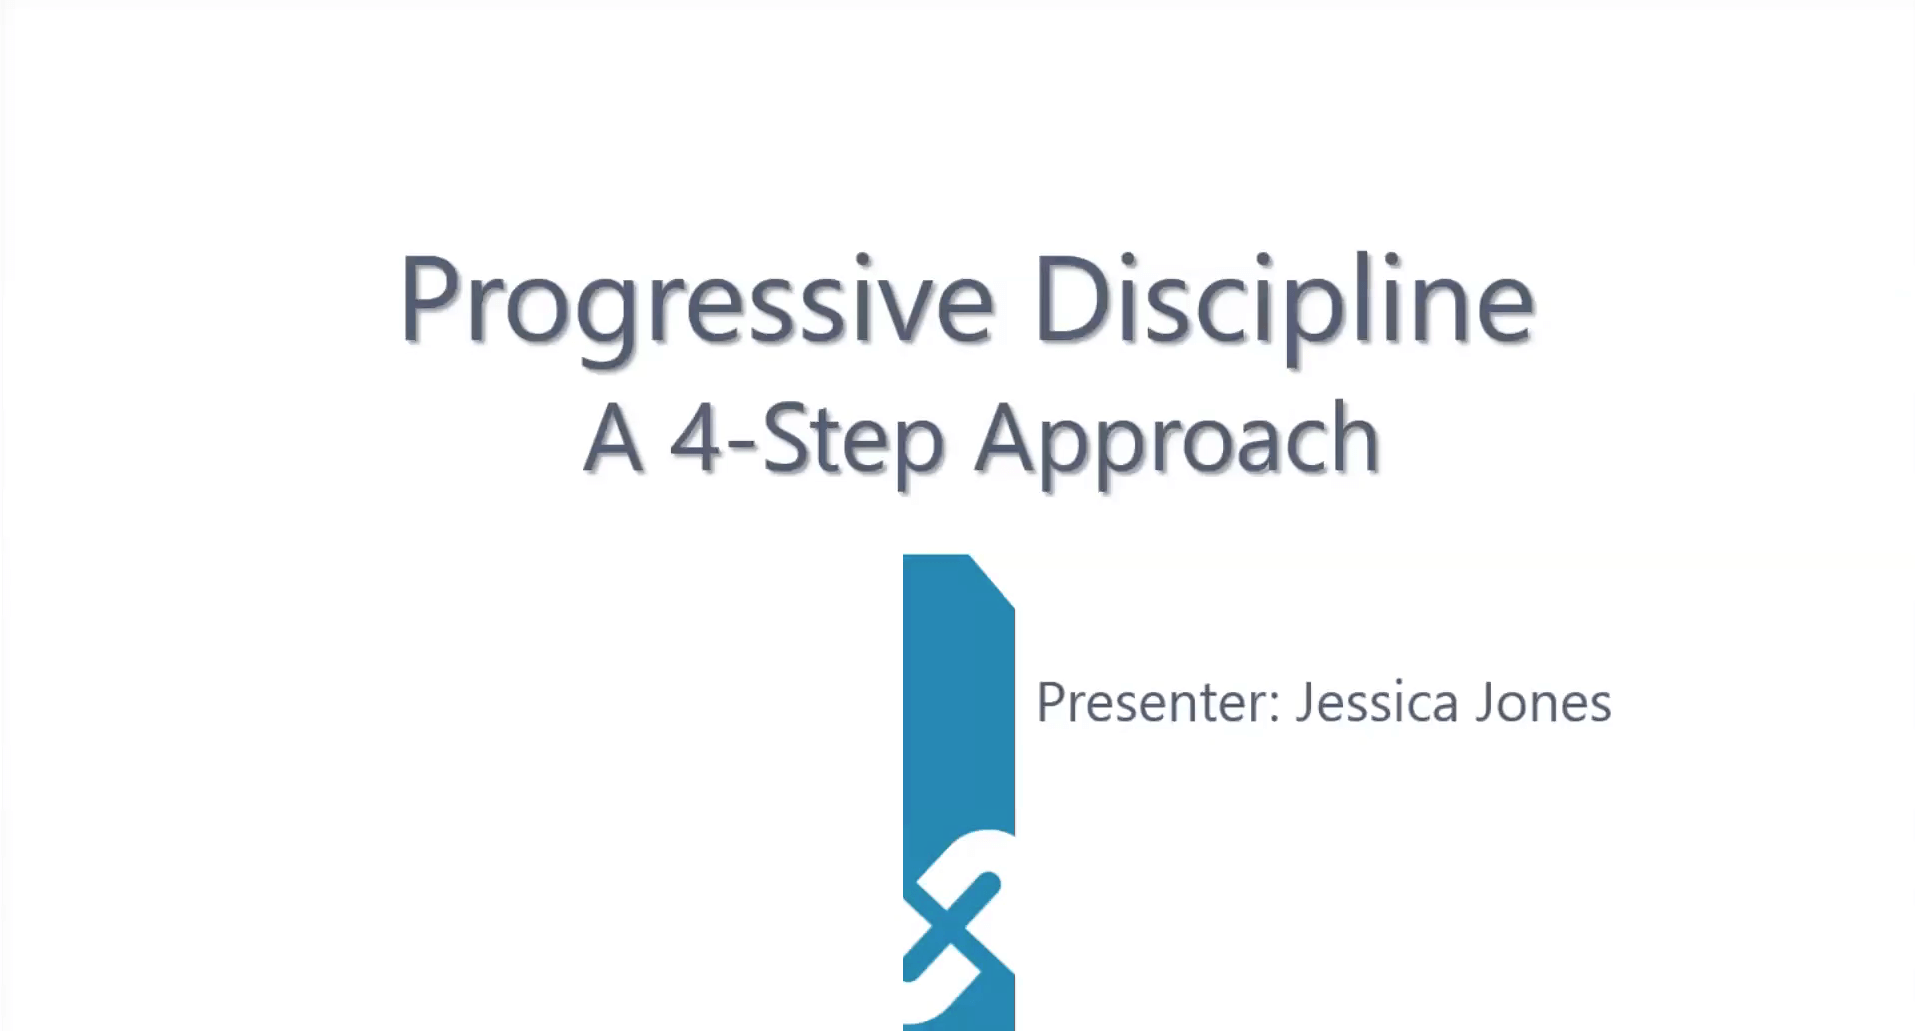 Progressive Discipline: A 4-Step Approach